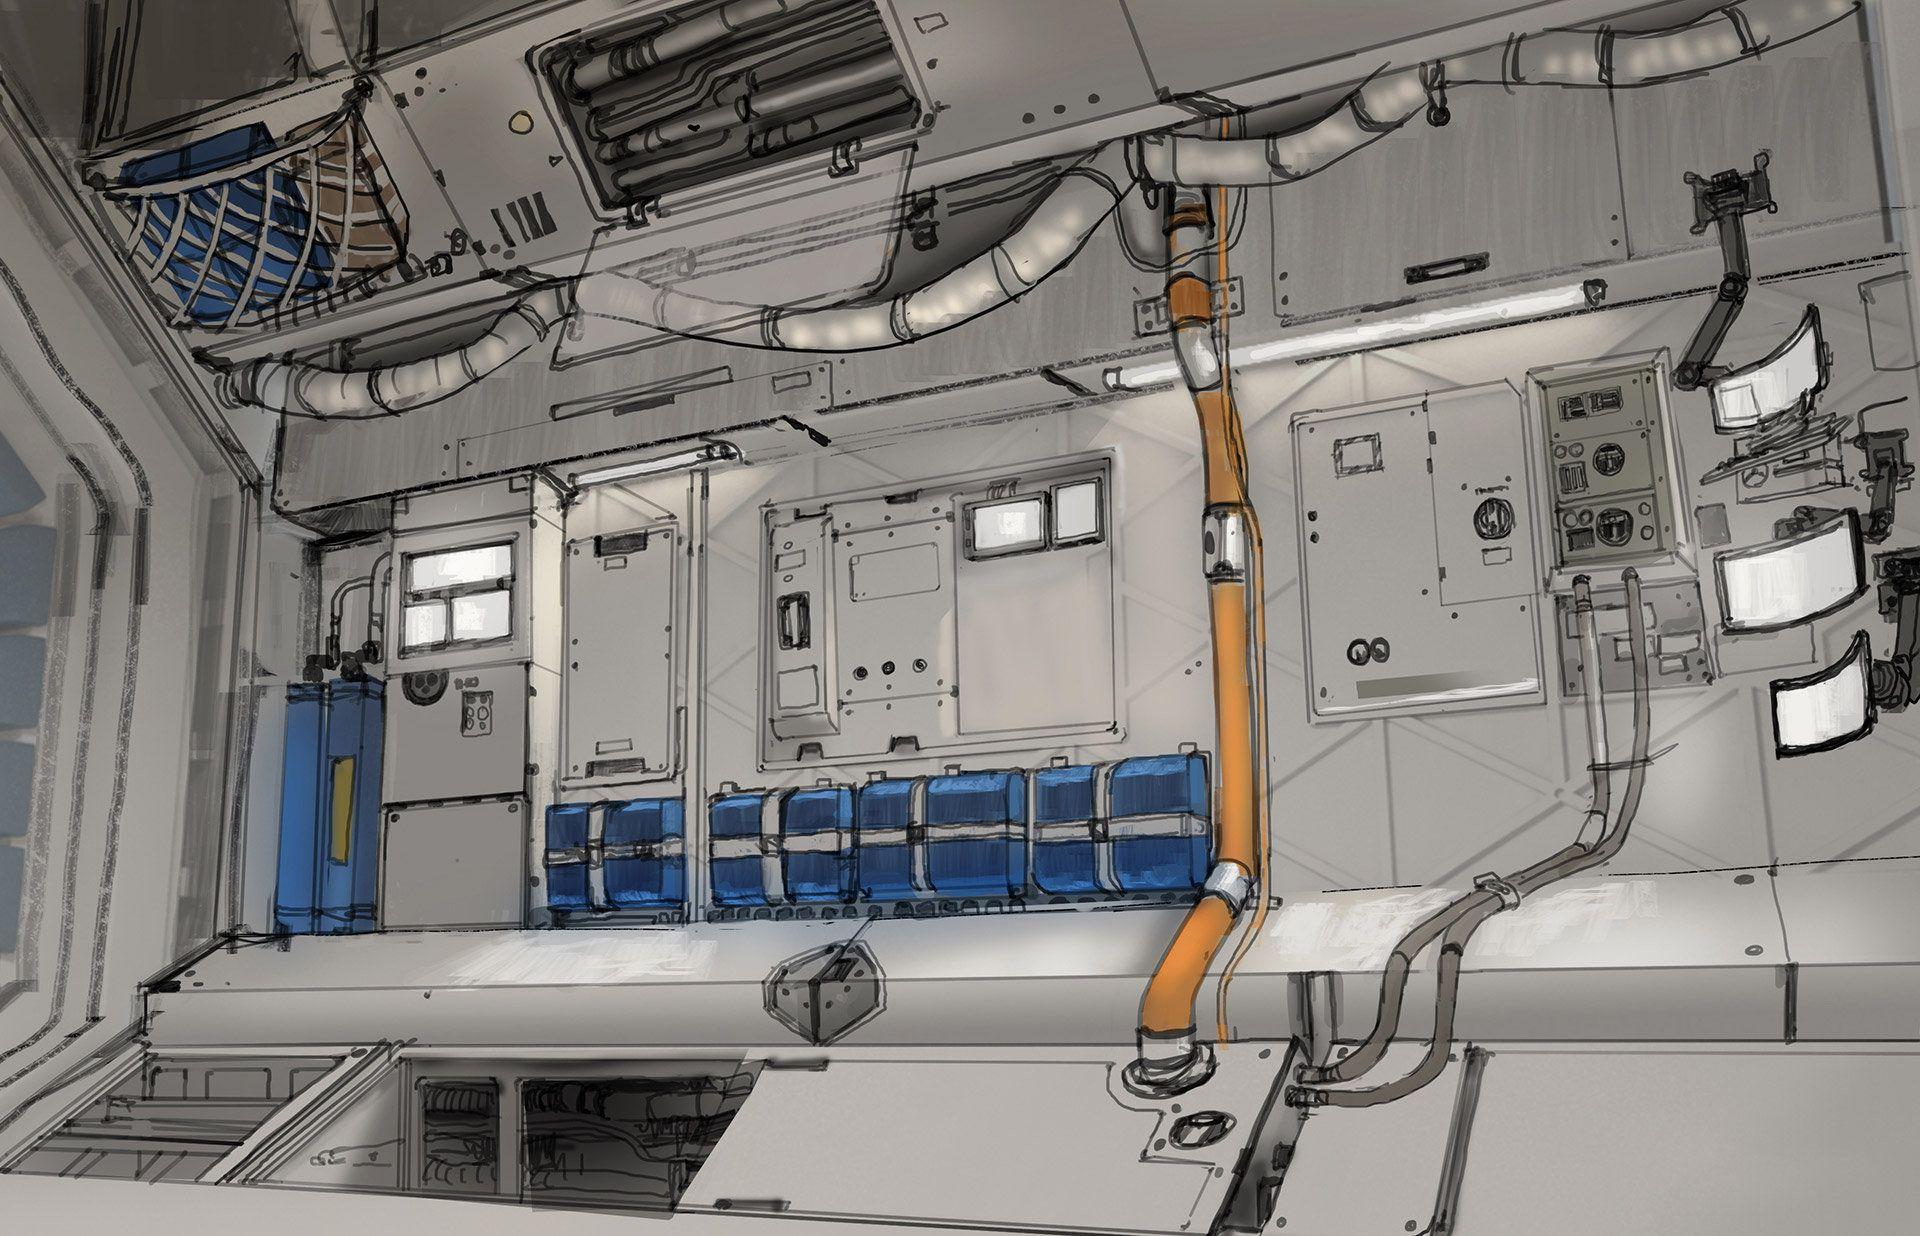 ArtStation - Exoplanet Station Design 02, Adrien Girod ...